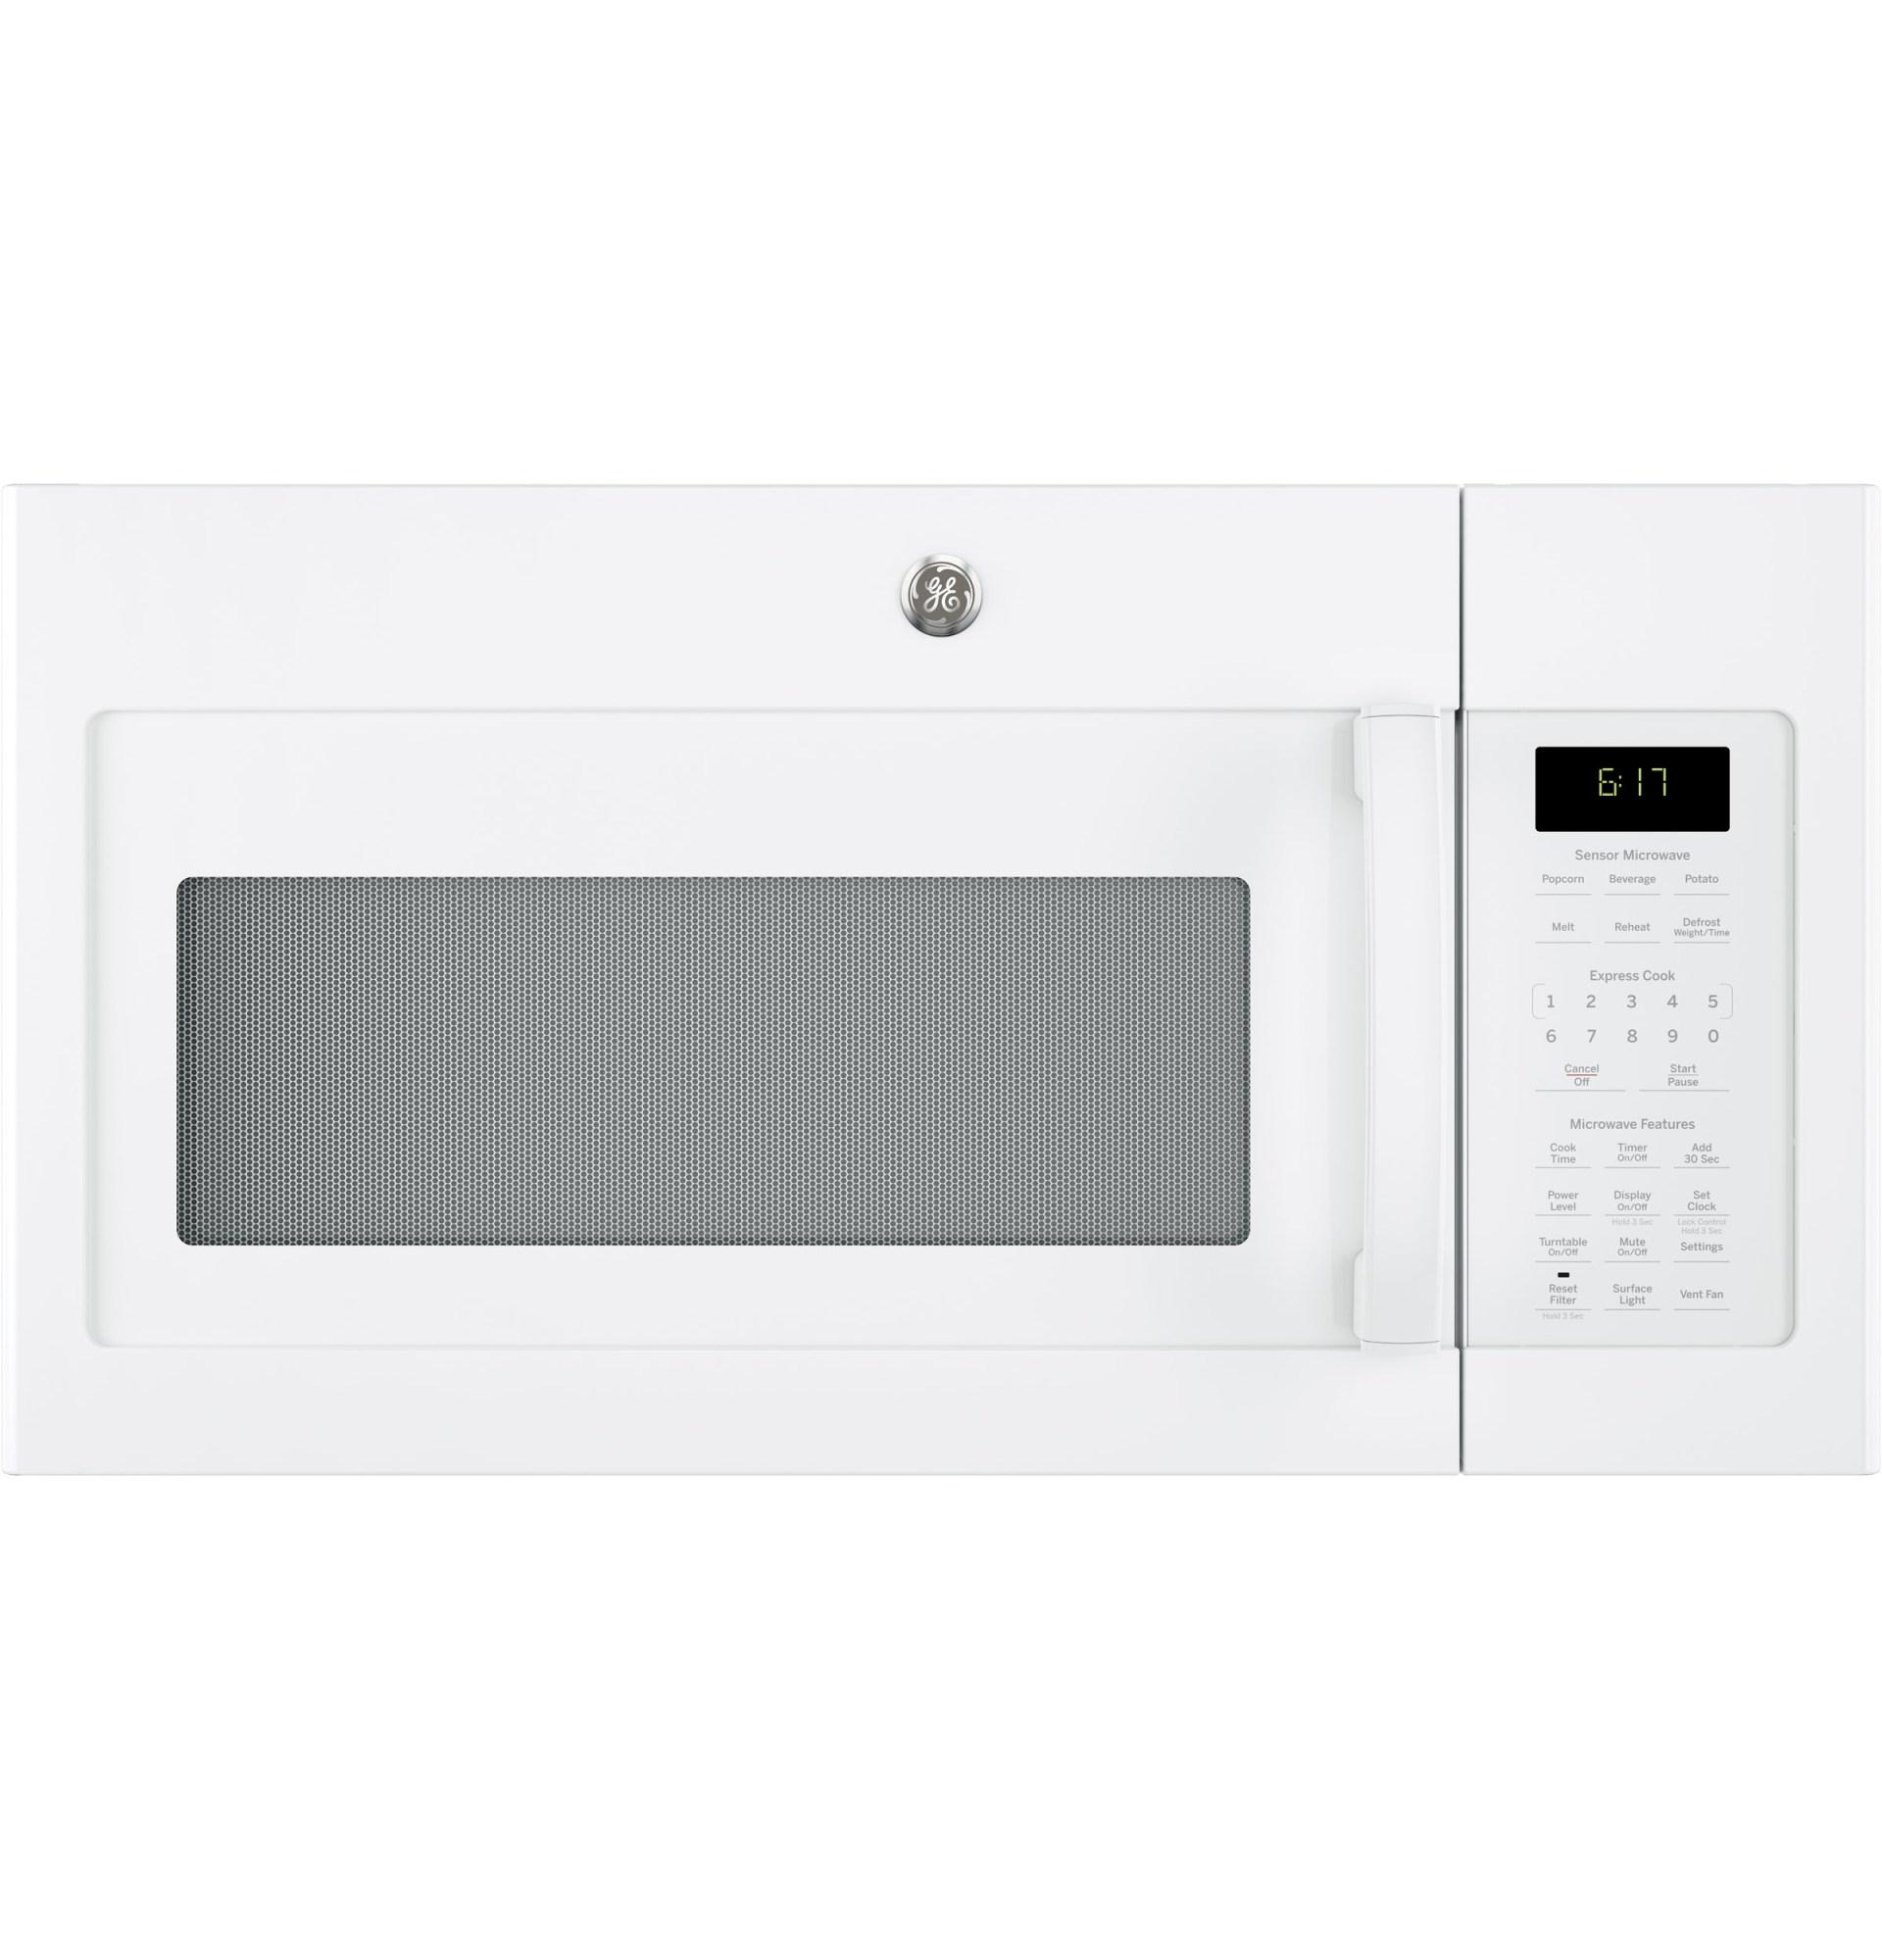 ge appliances jvm6175dkww 1 7 cu ft